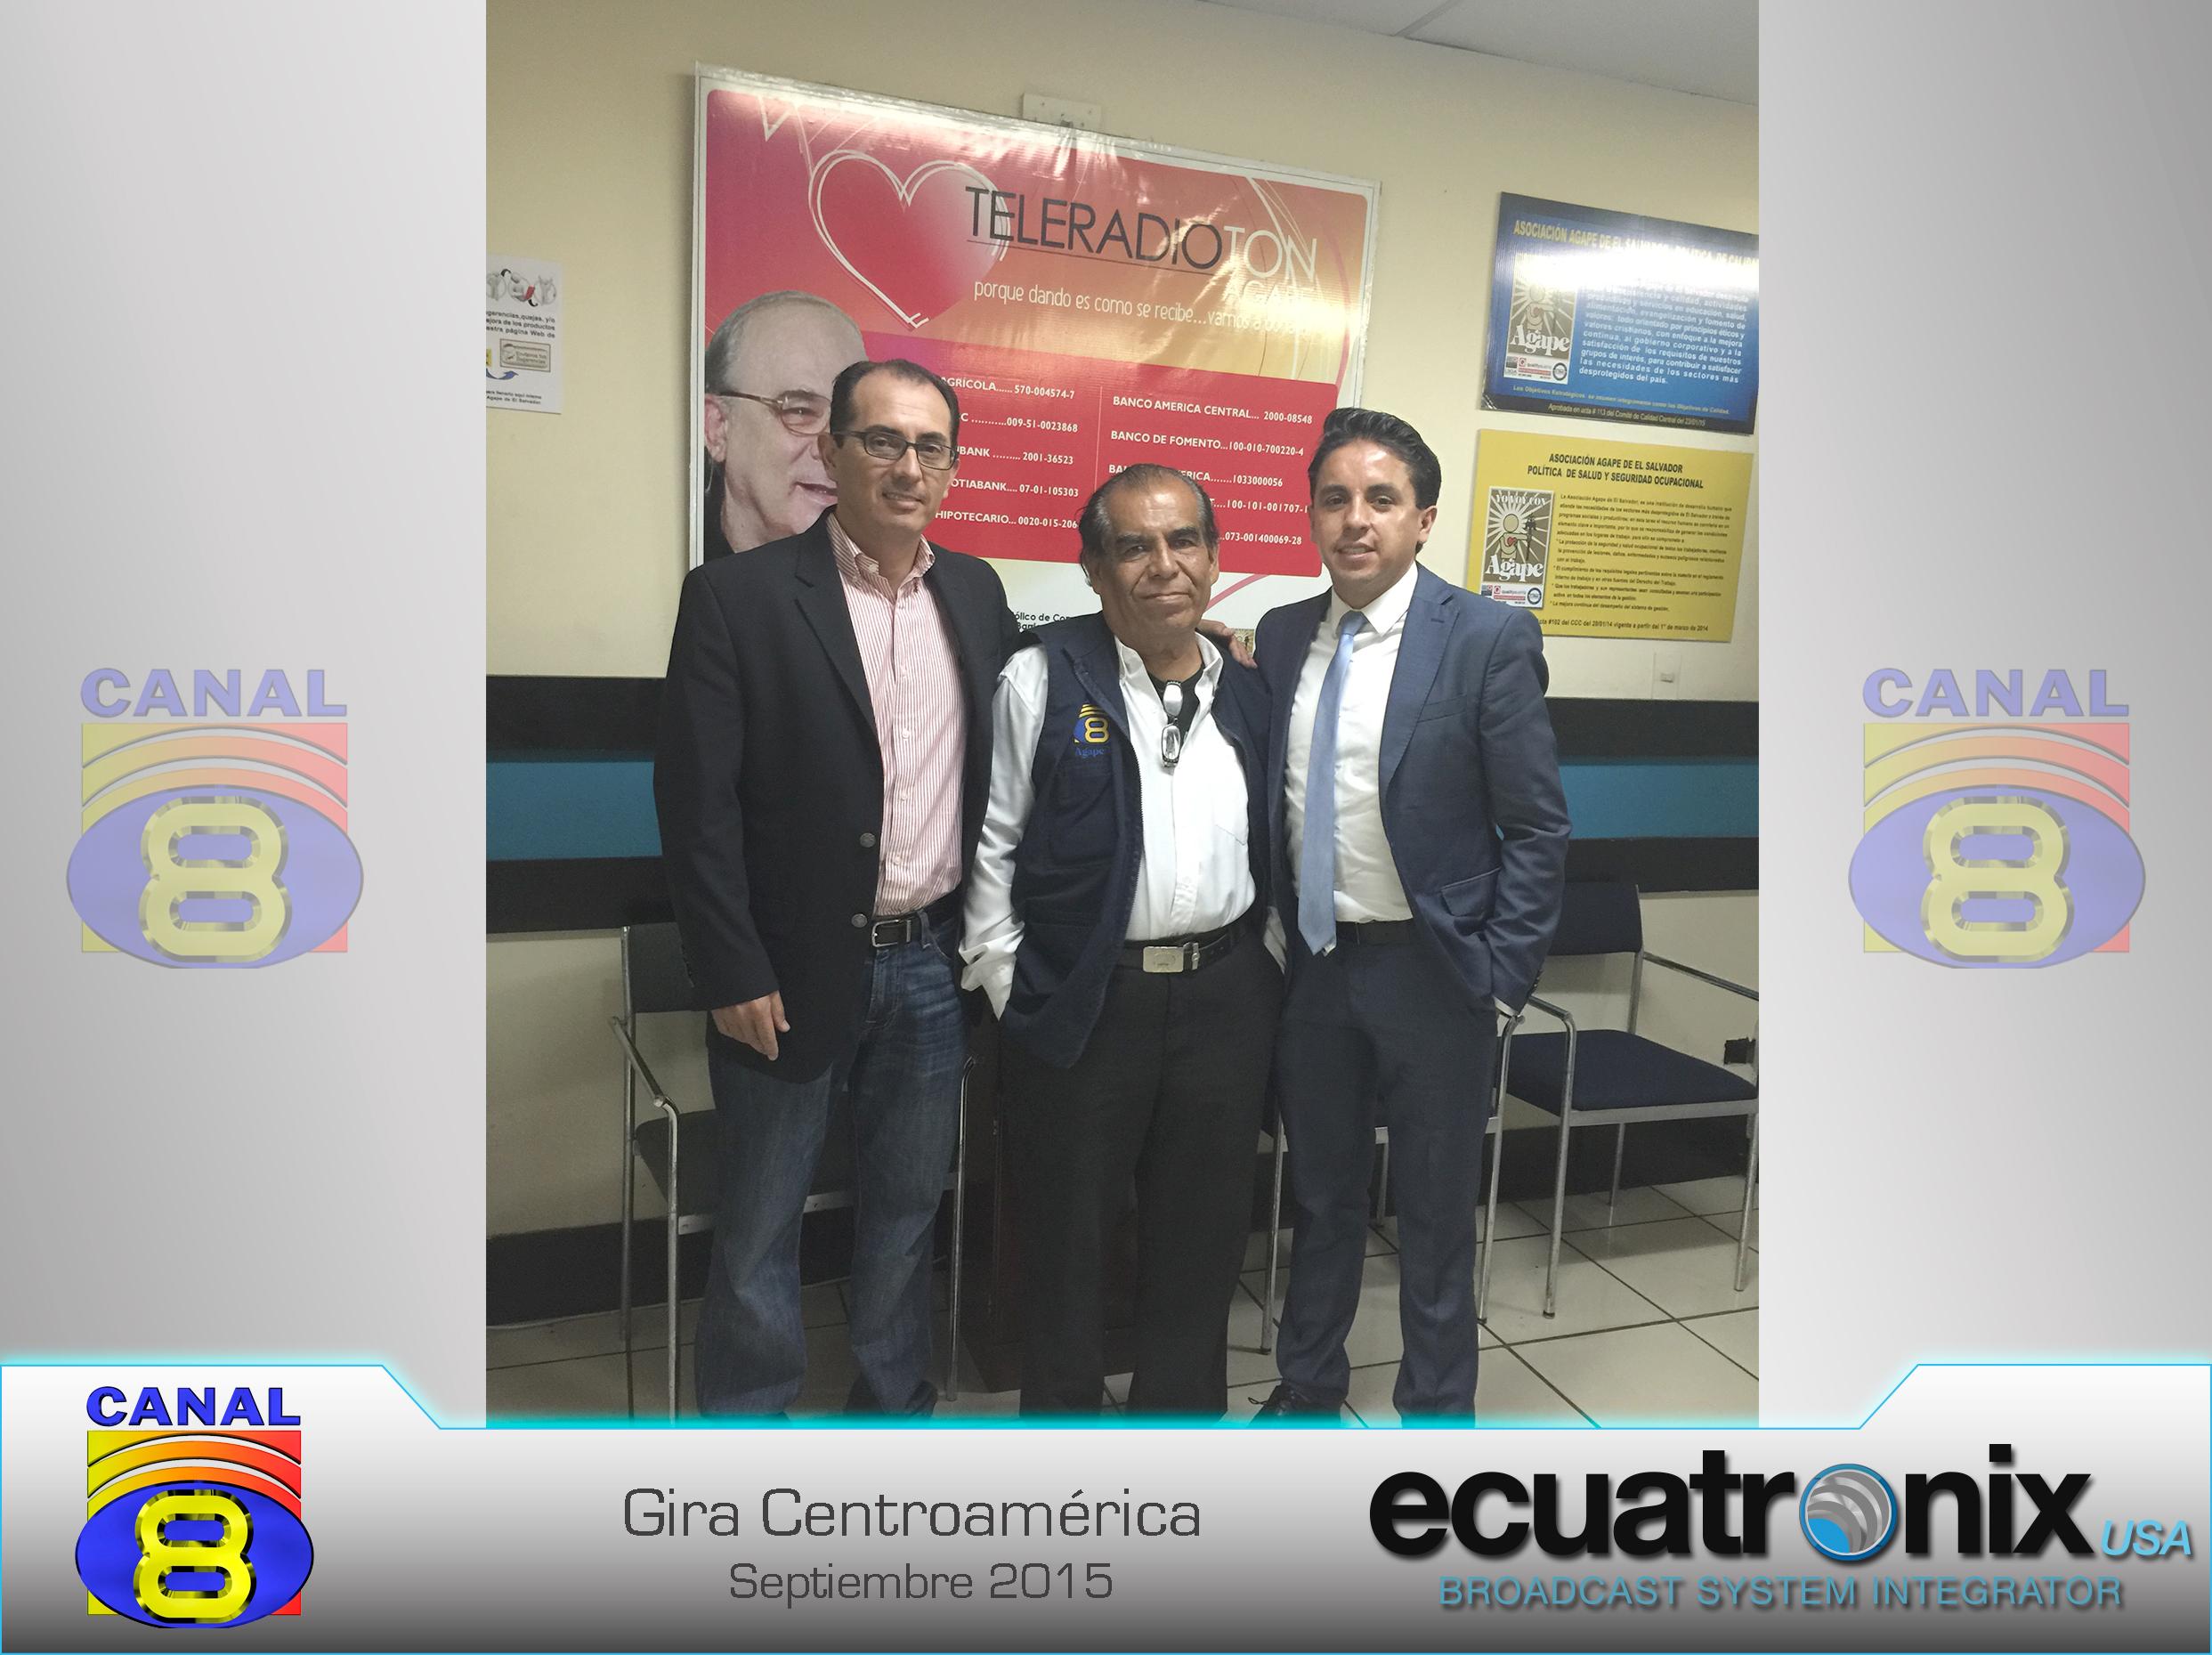 ecuatronix-usa-El-Salvador-agape-canal-8